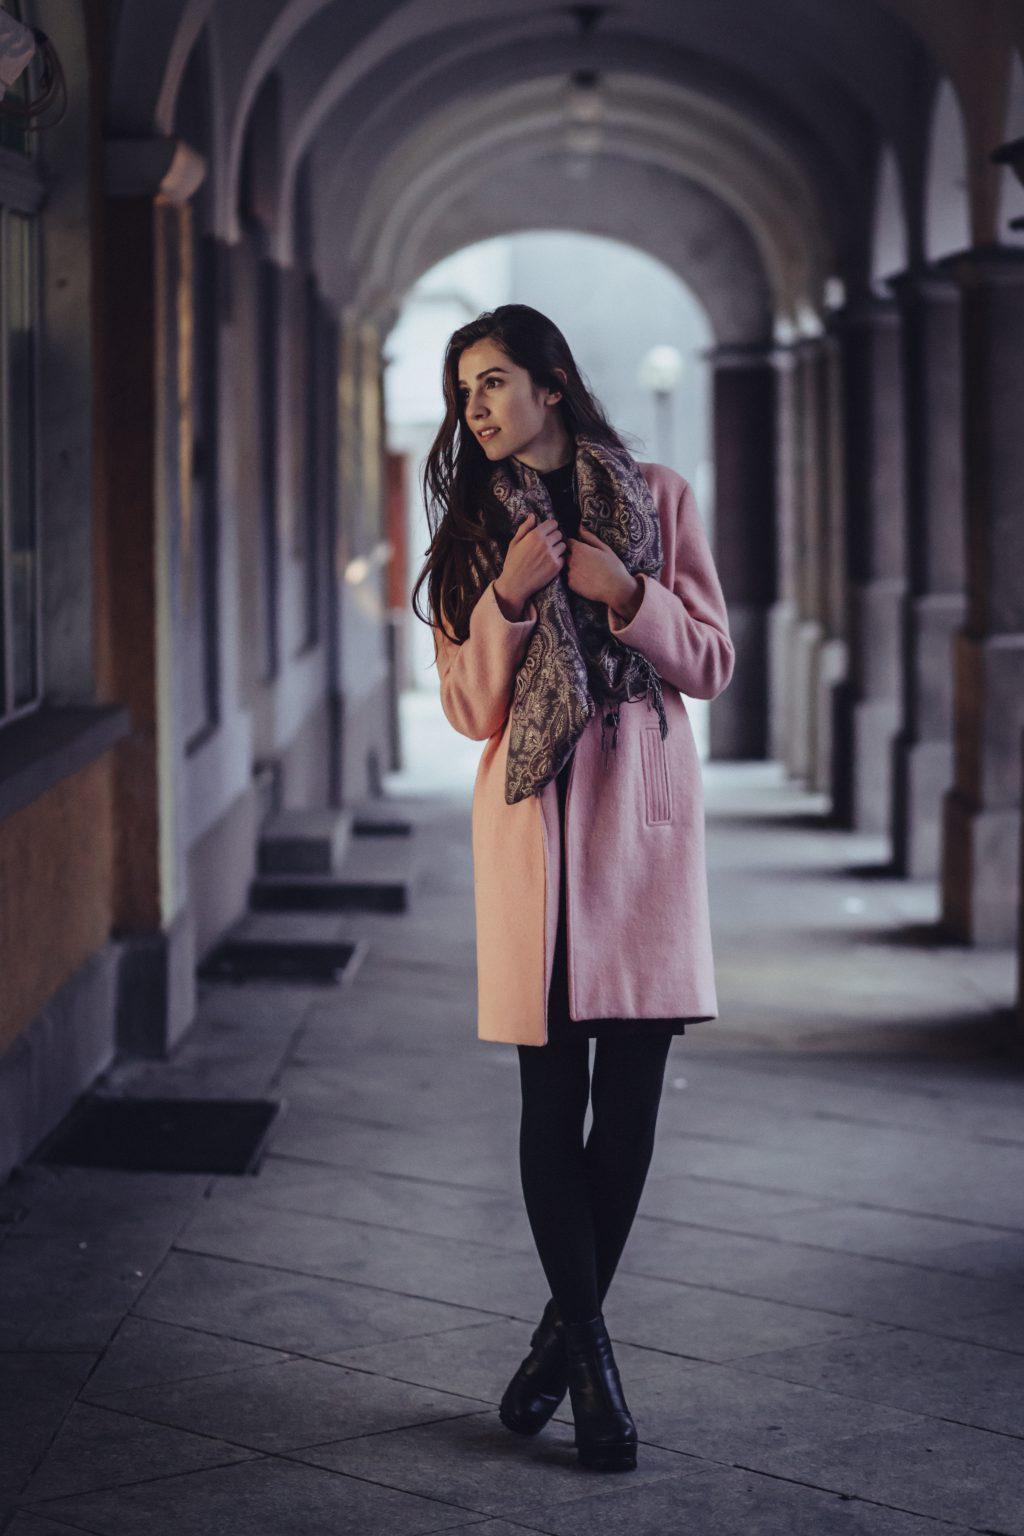 A woman posing under arcades - free stock photo